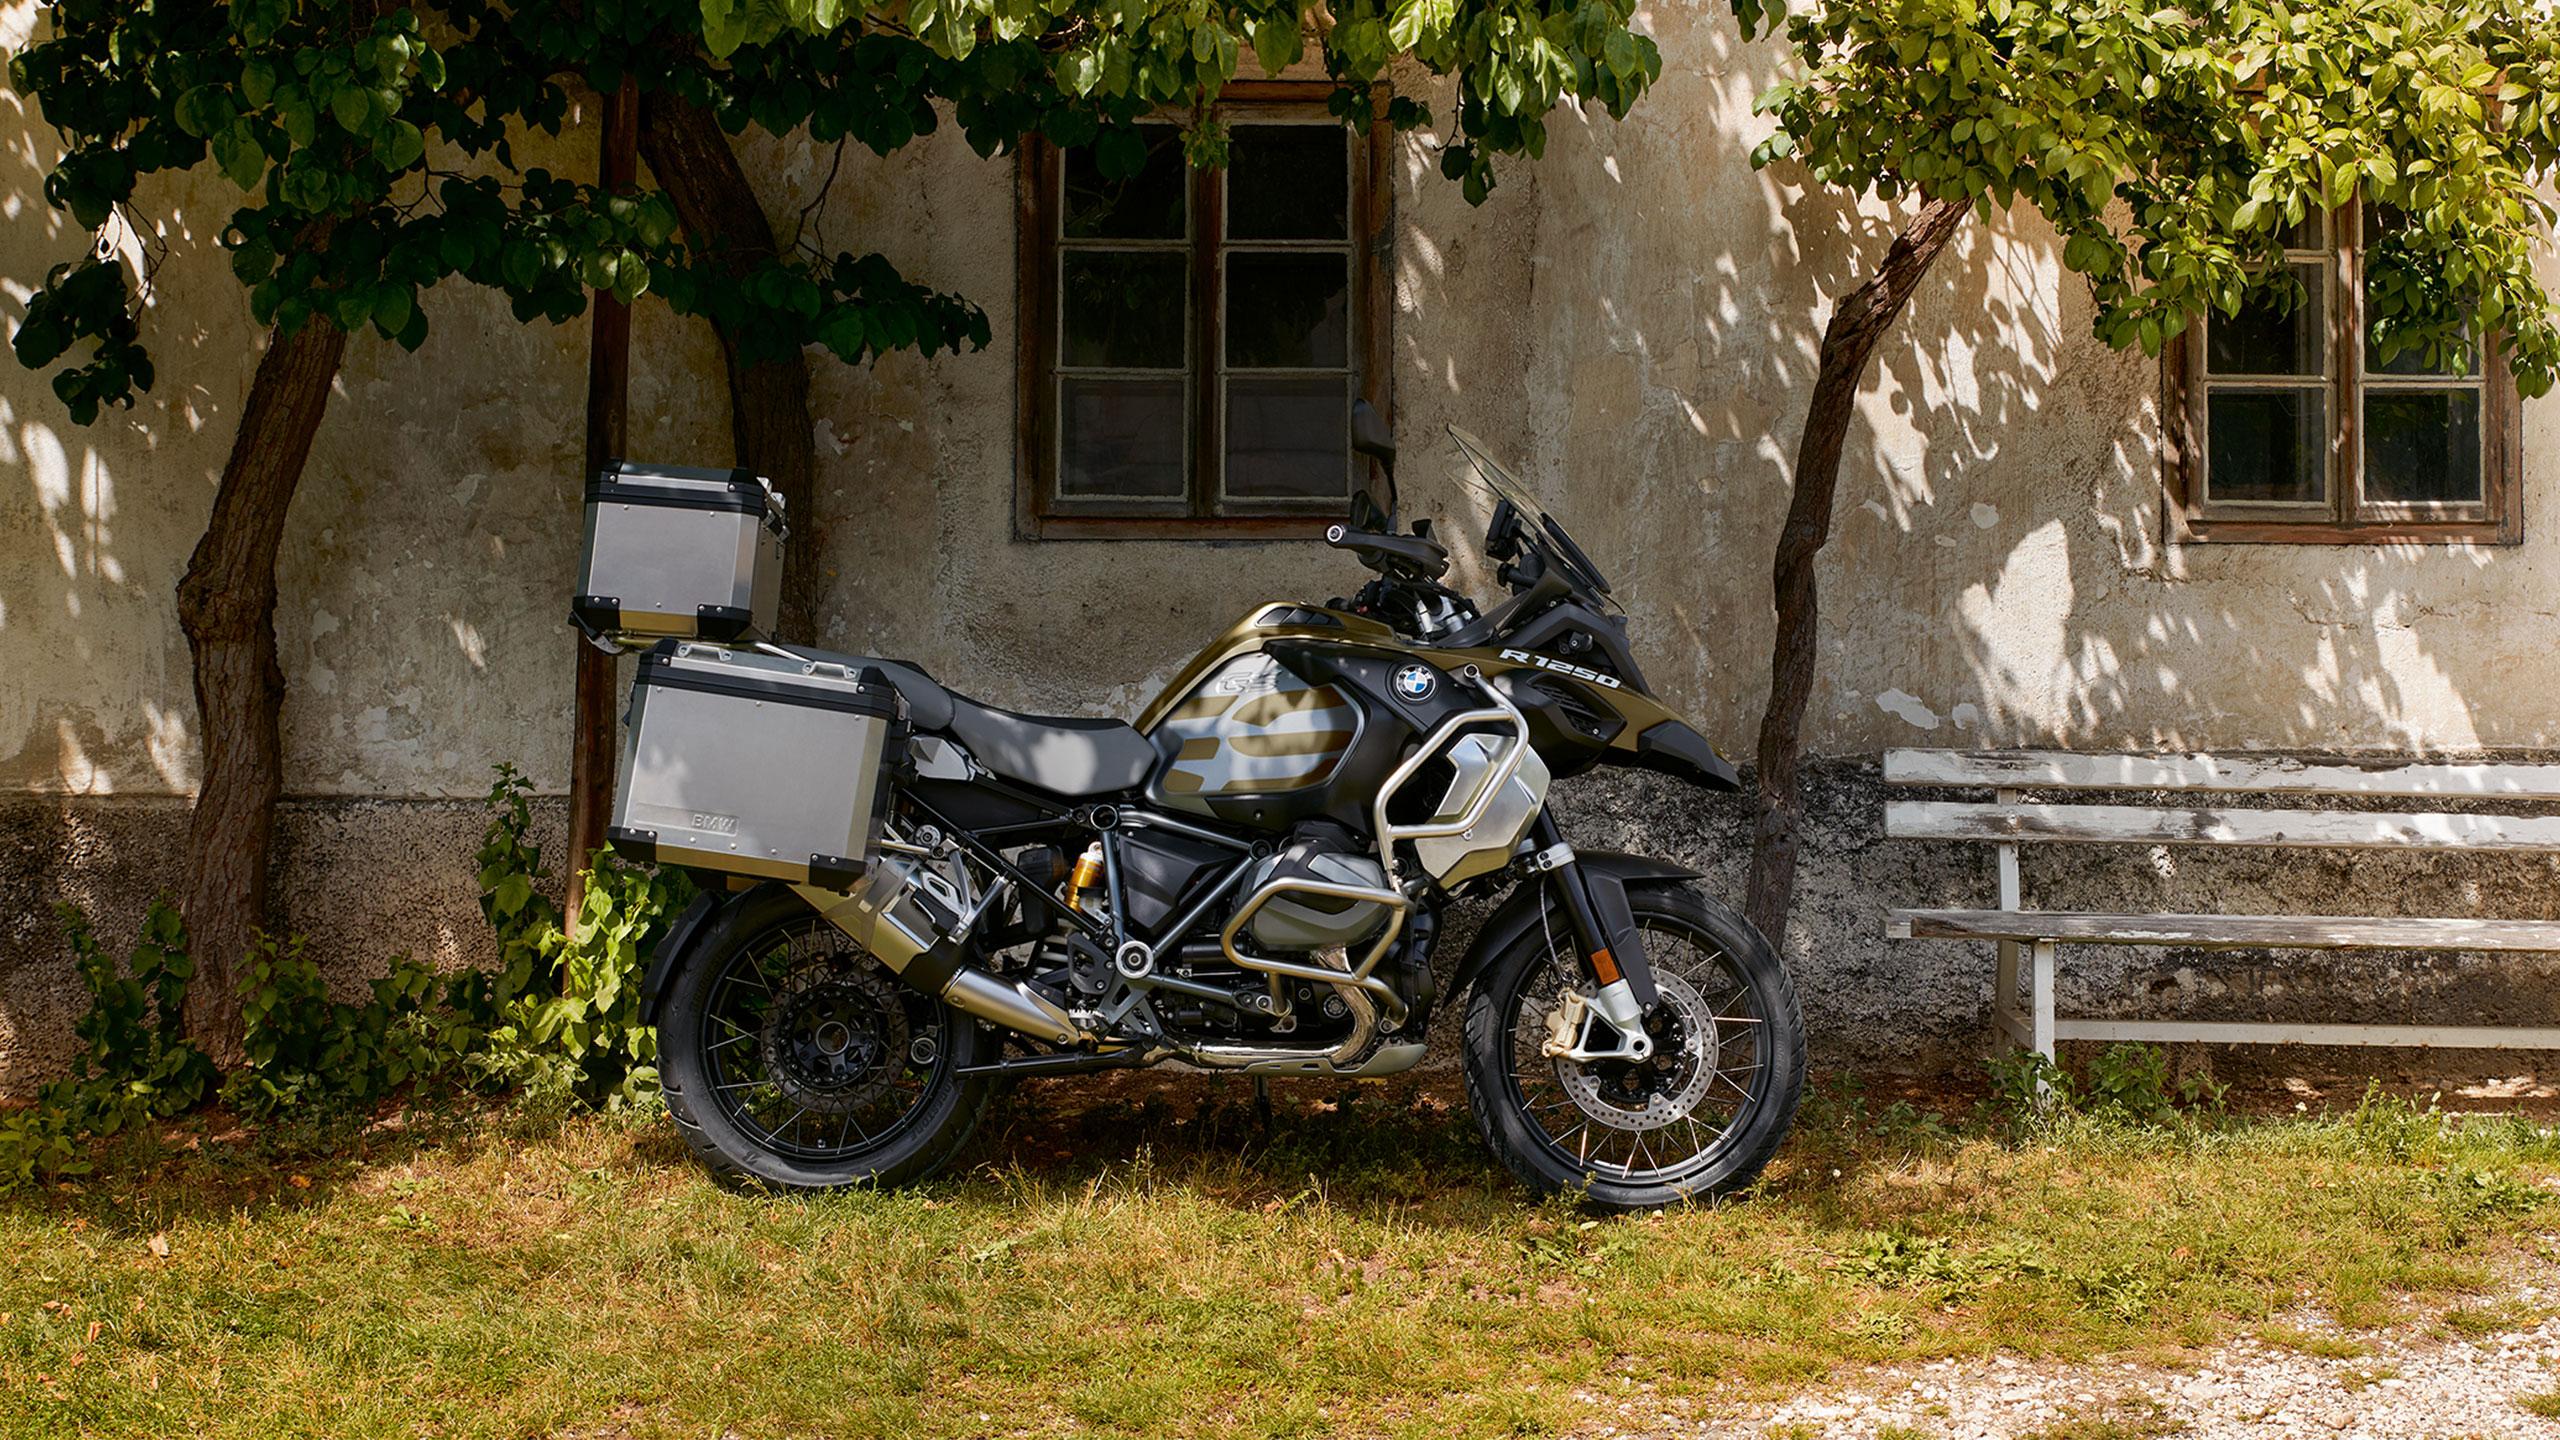 r1250gs_adventure_wna2_original_2560x1440_jpg_asset_1539001068204.jpg